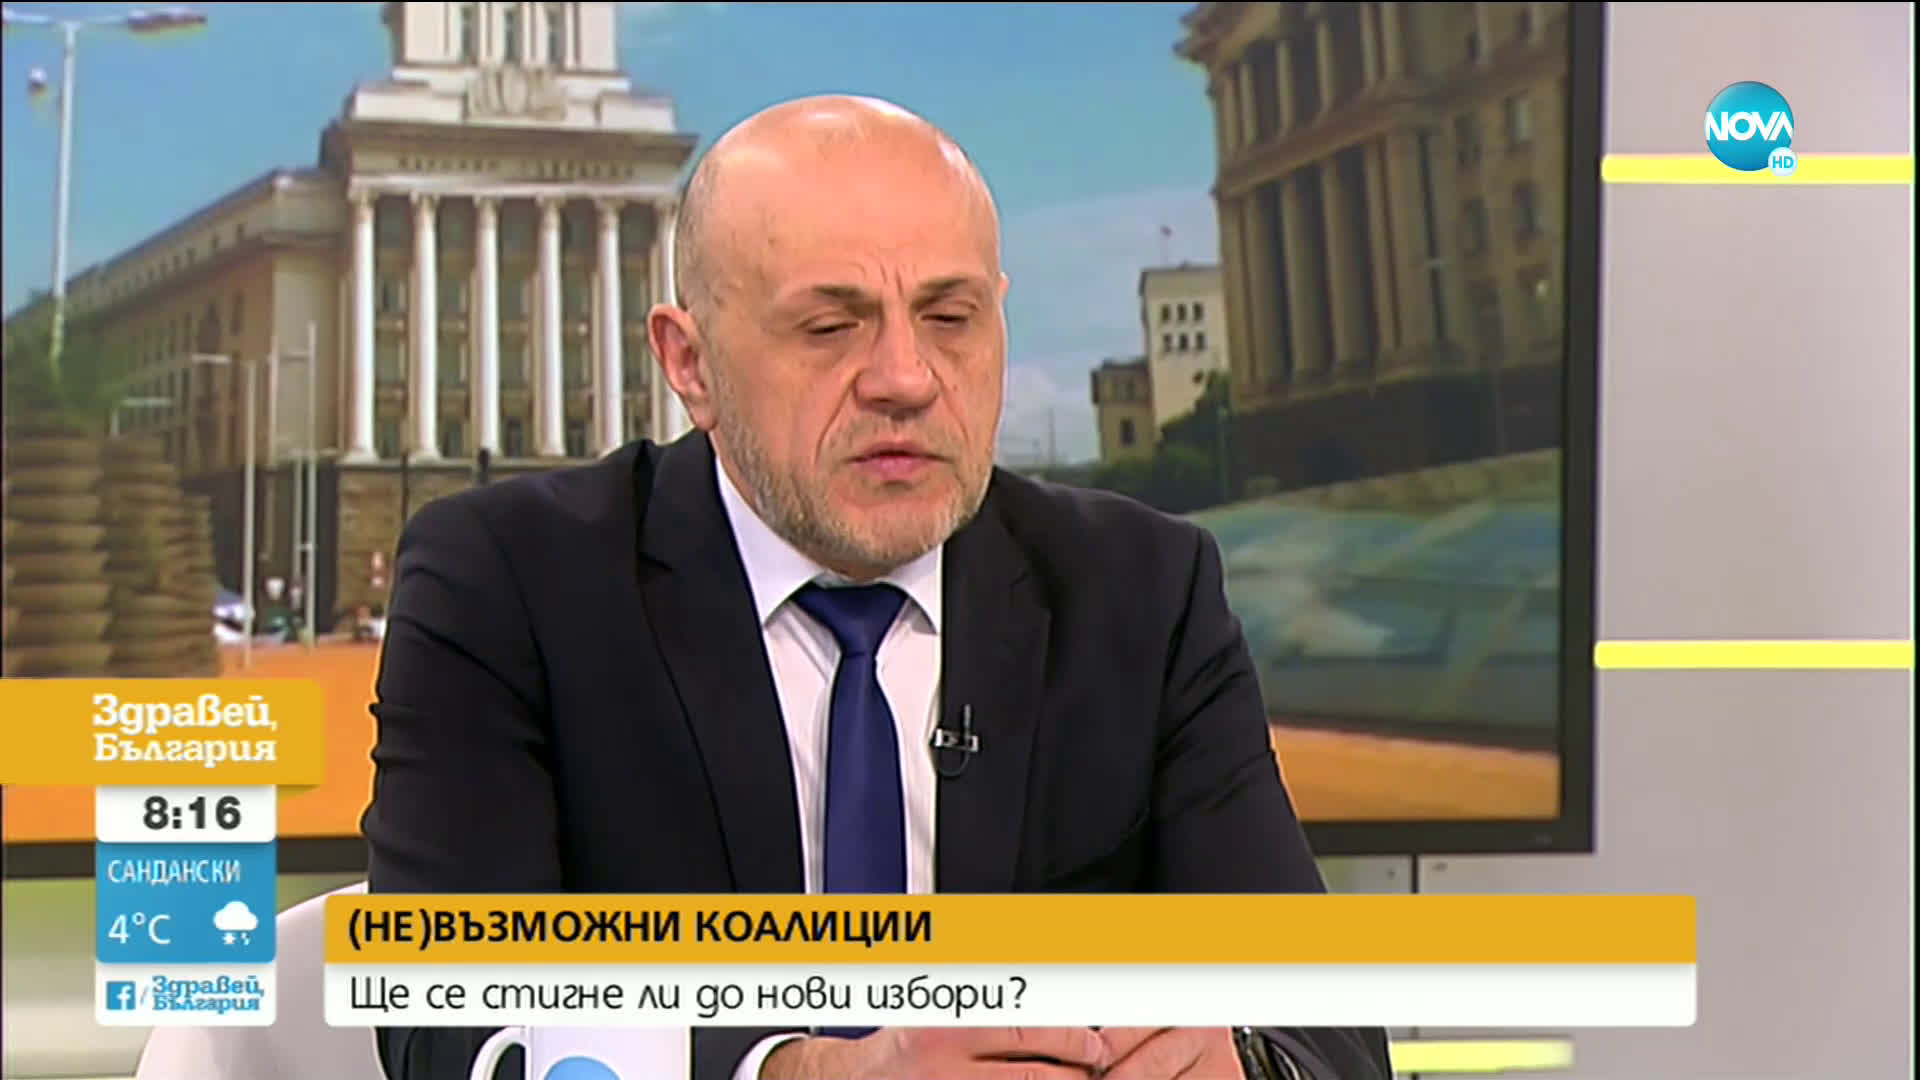 Дончев: Бихме дали знакова подкрепа на Трифонов, ако не му достигат 3-4 гласа